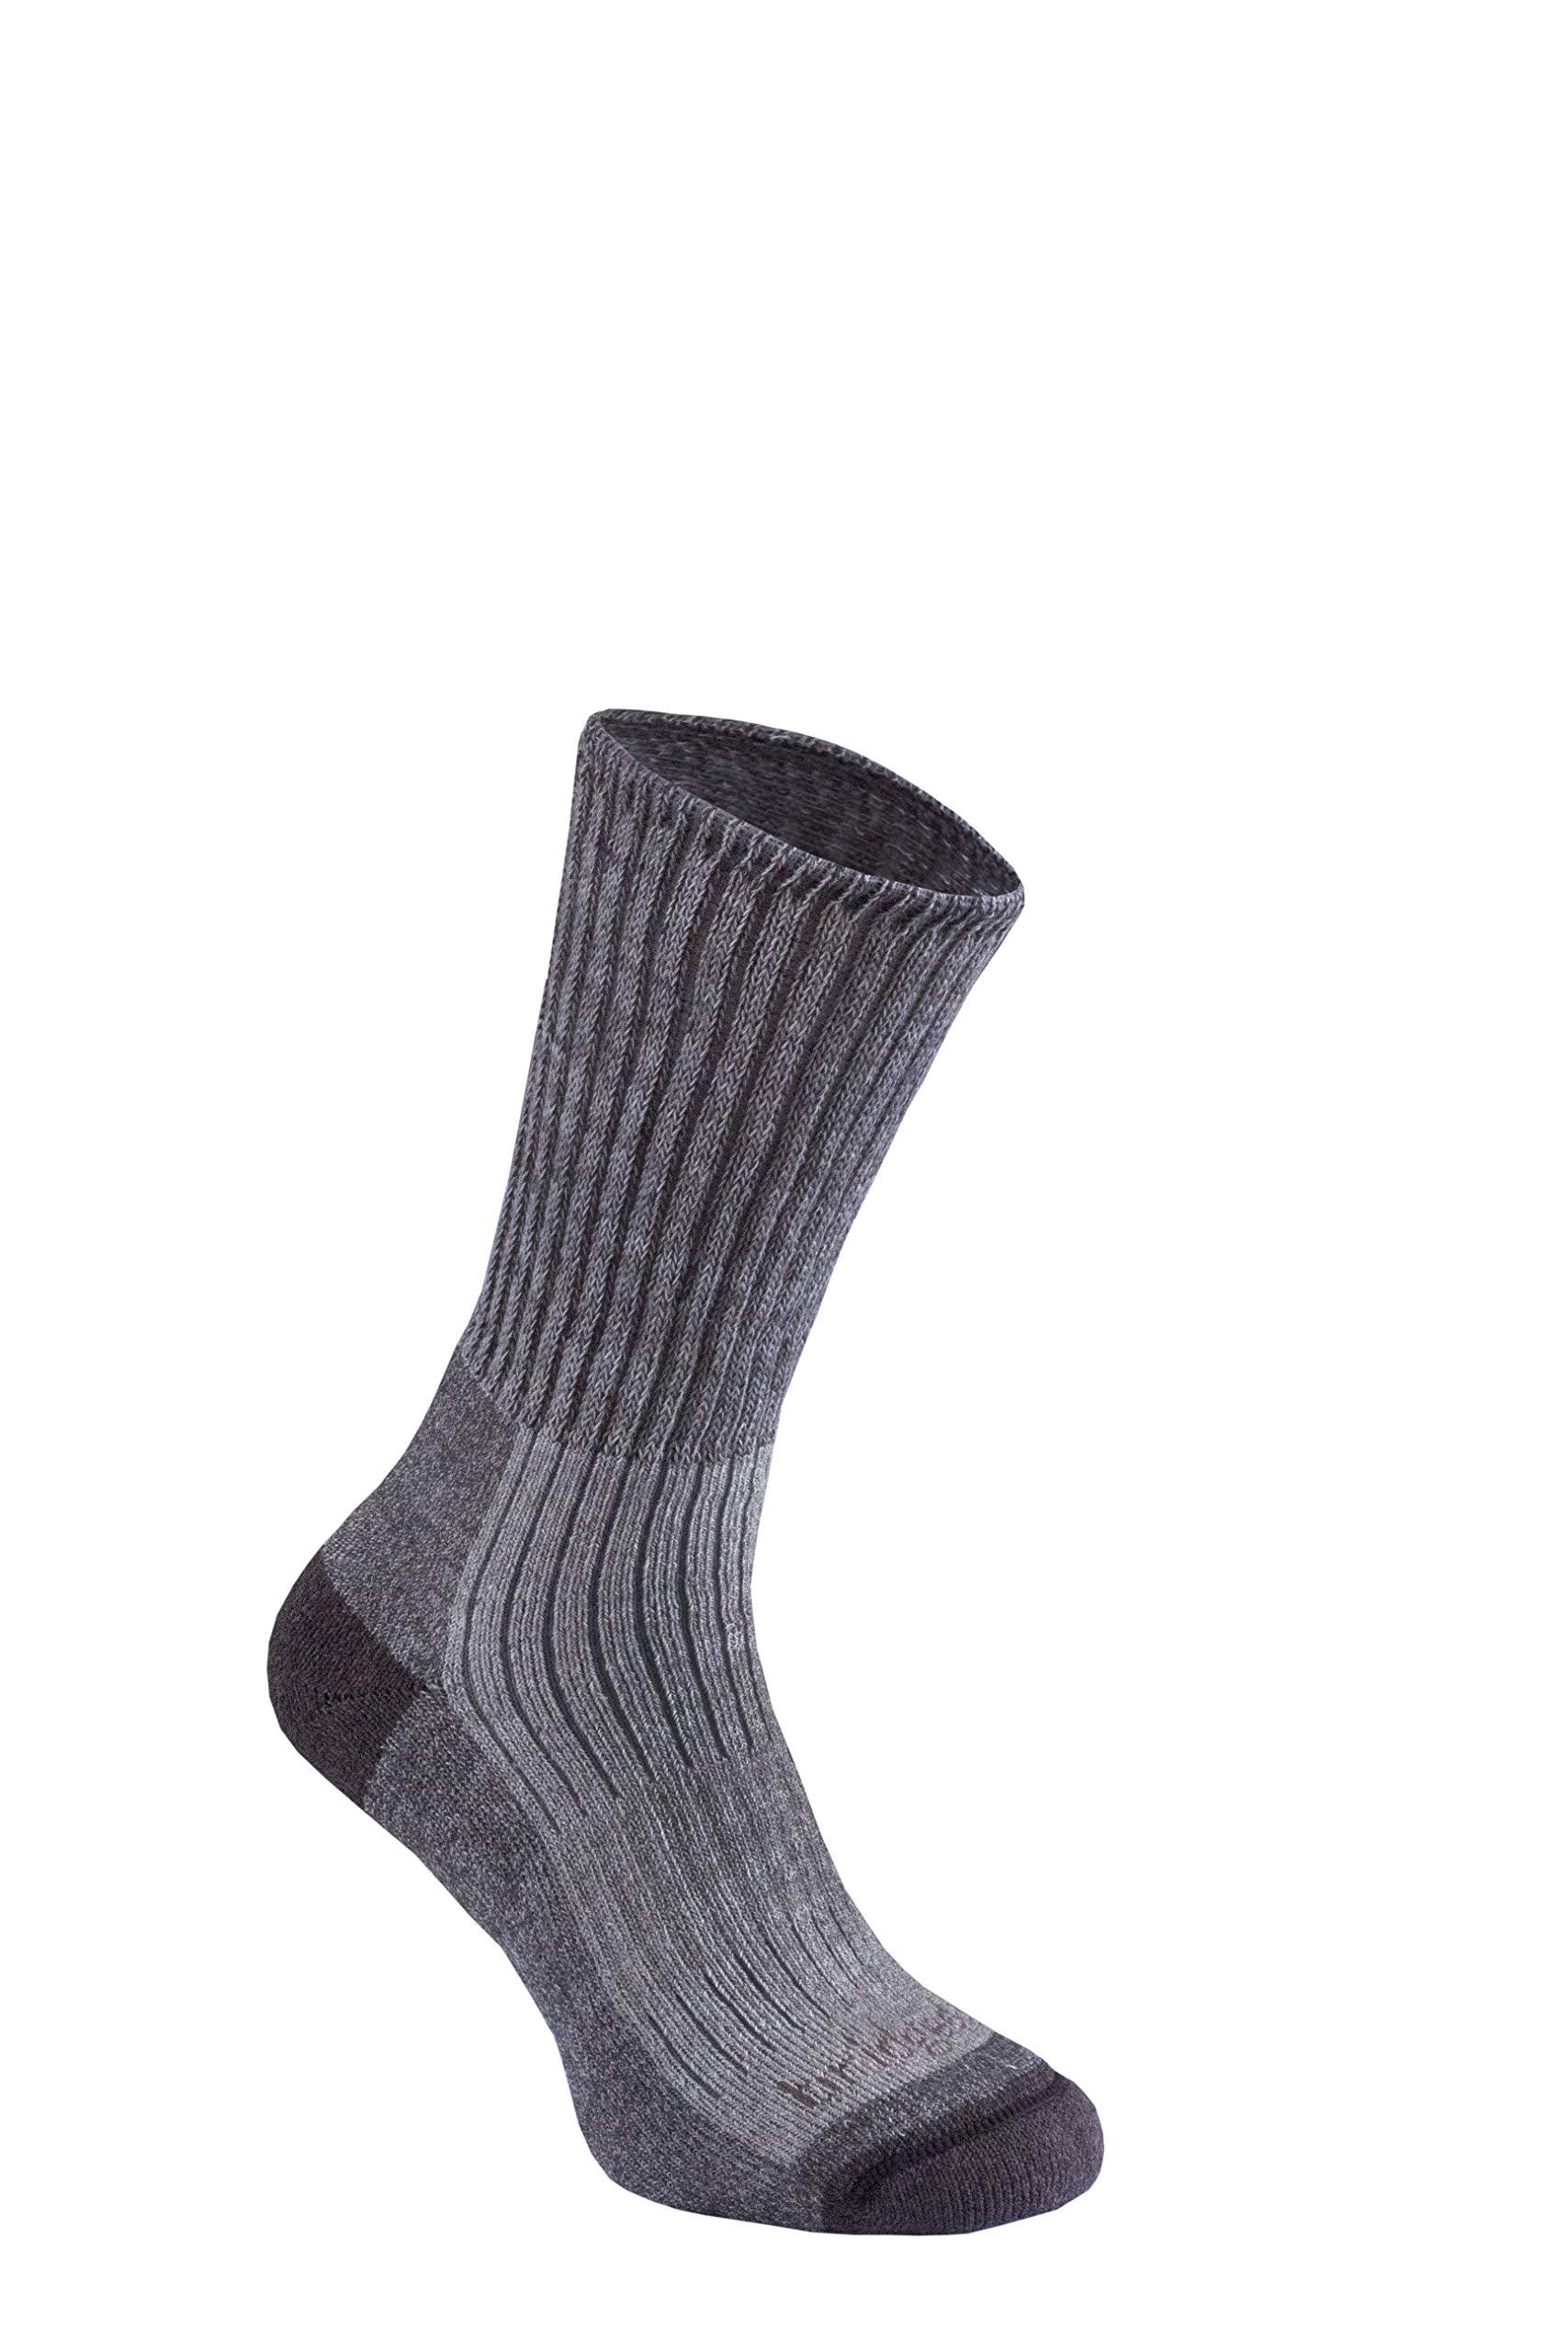 Bridgedale Hike Midweight Boot Height- Merino Comfort Socks Hike Midweight Boot Height - Merino Comfort Socks